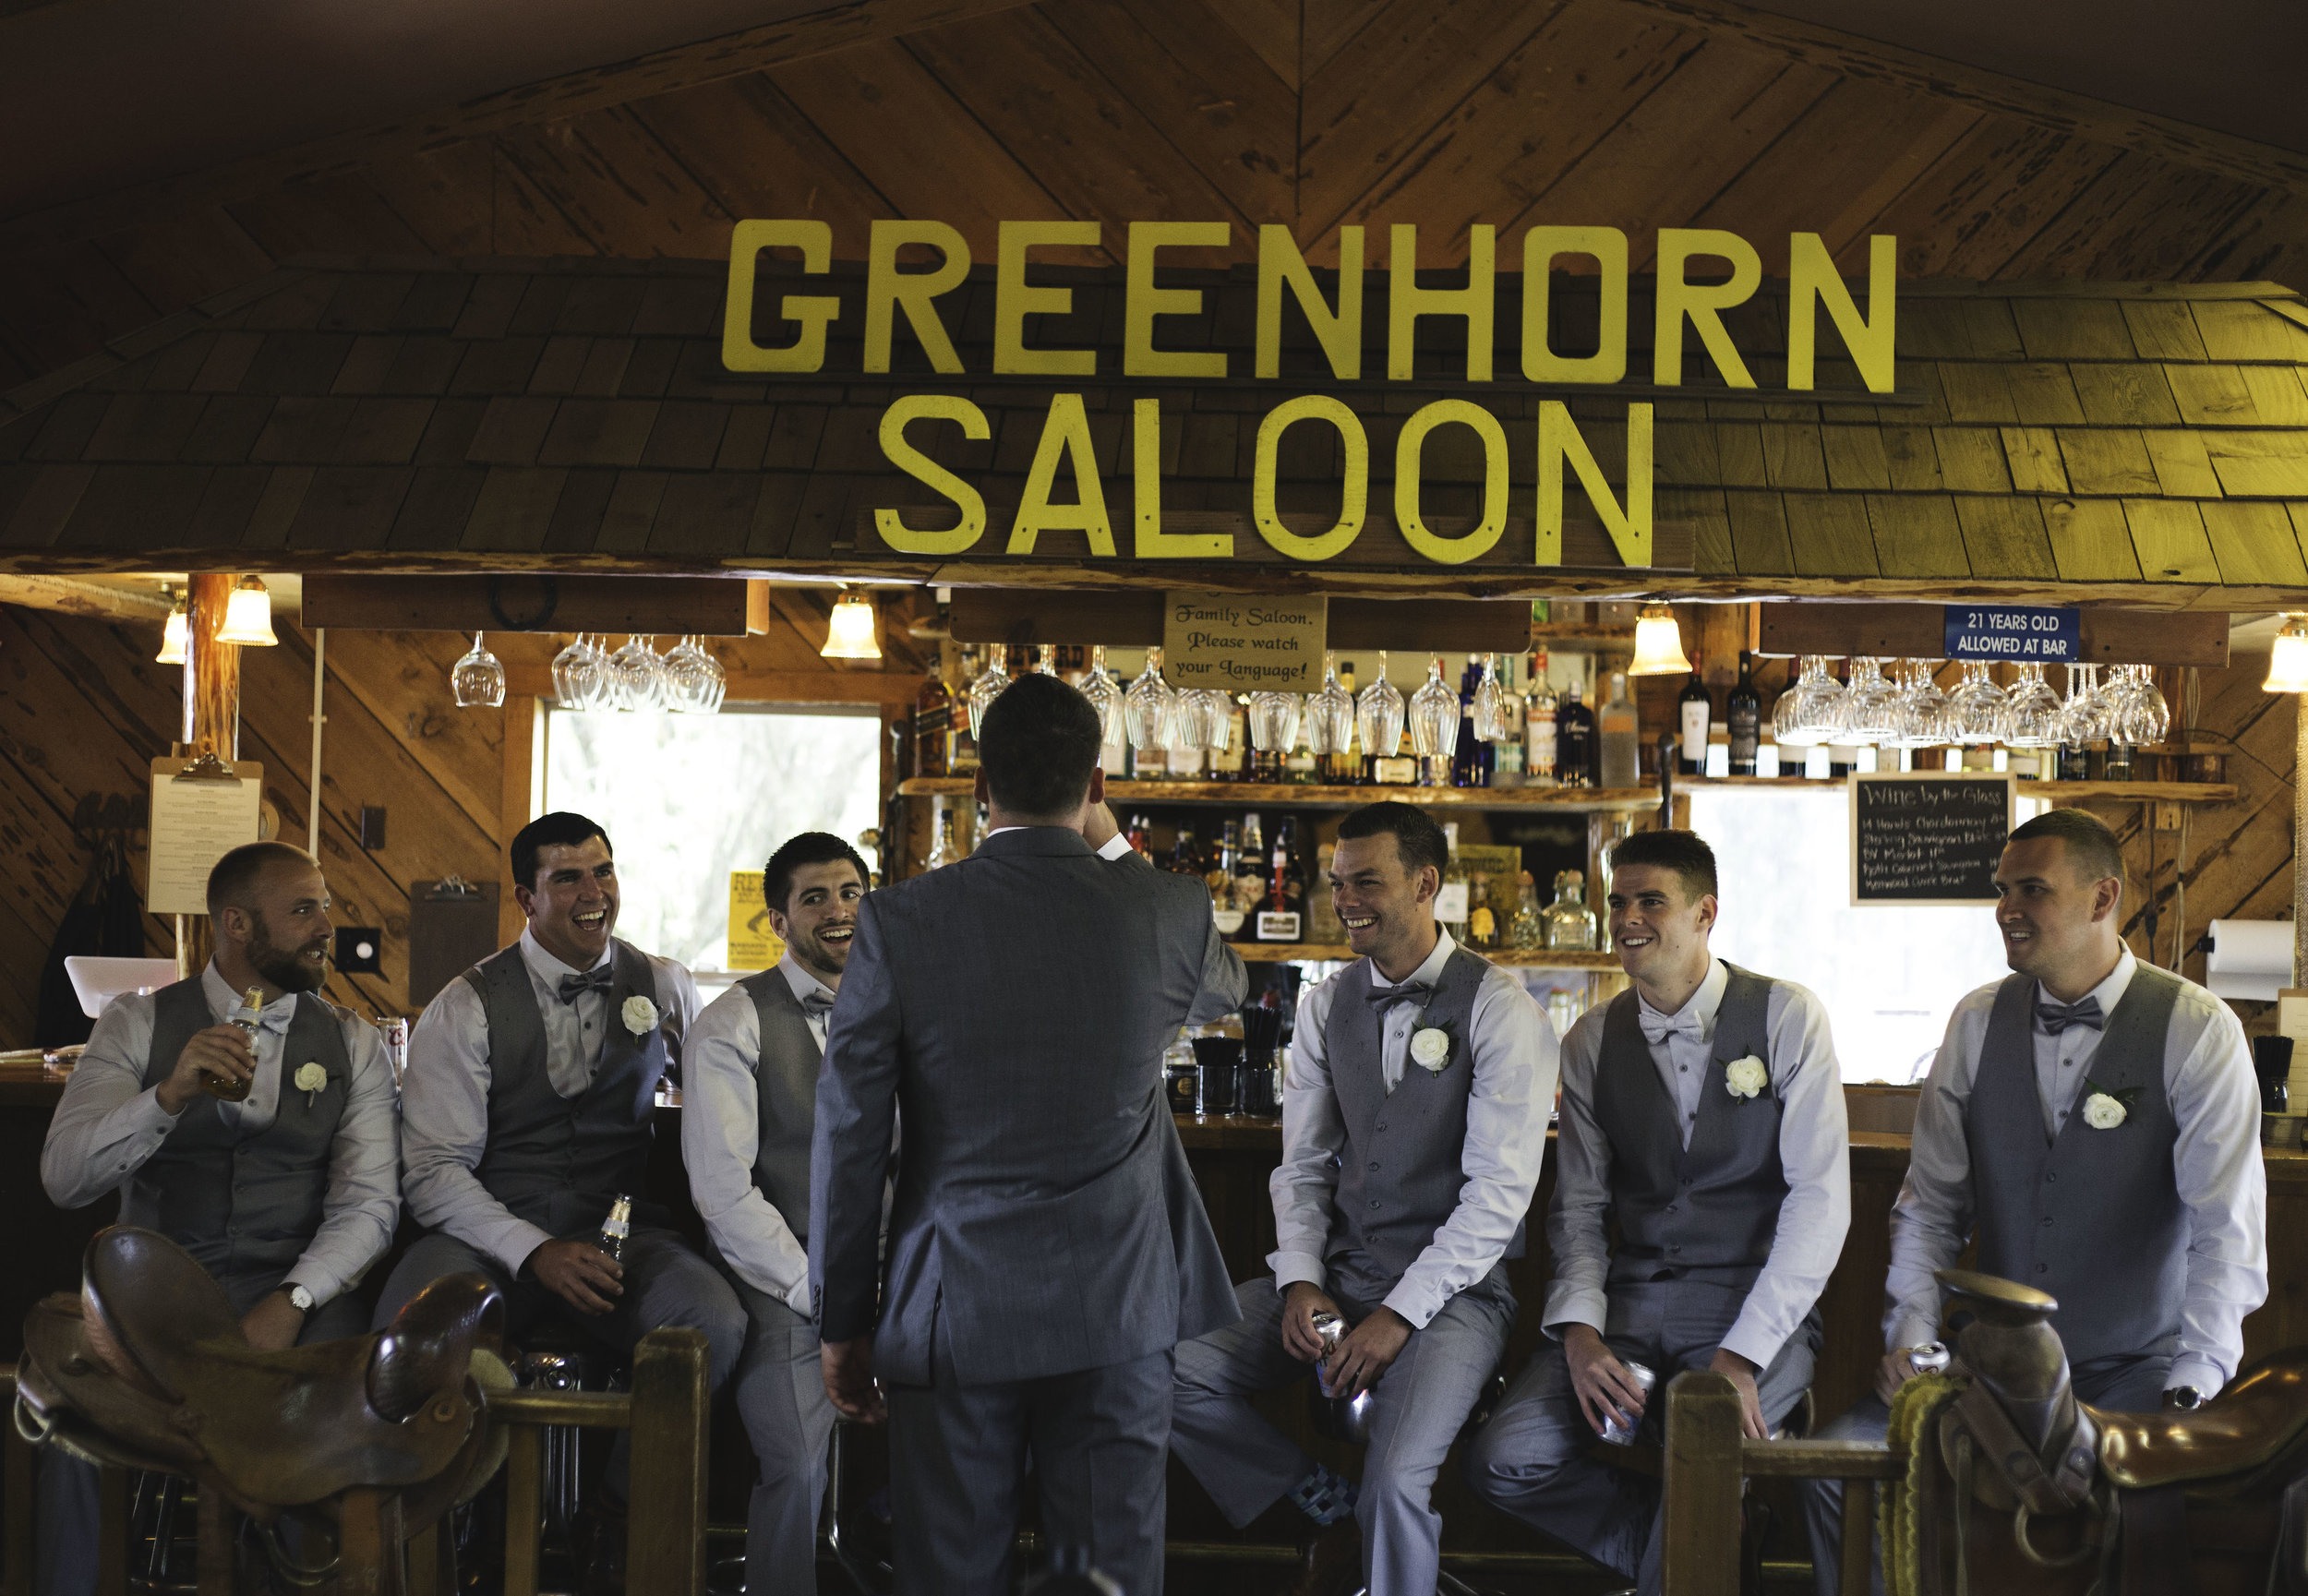 Greenhorn Saloon Wedding Reception